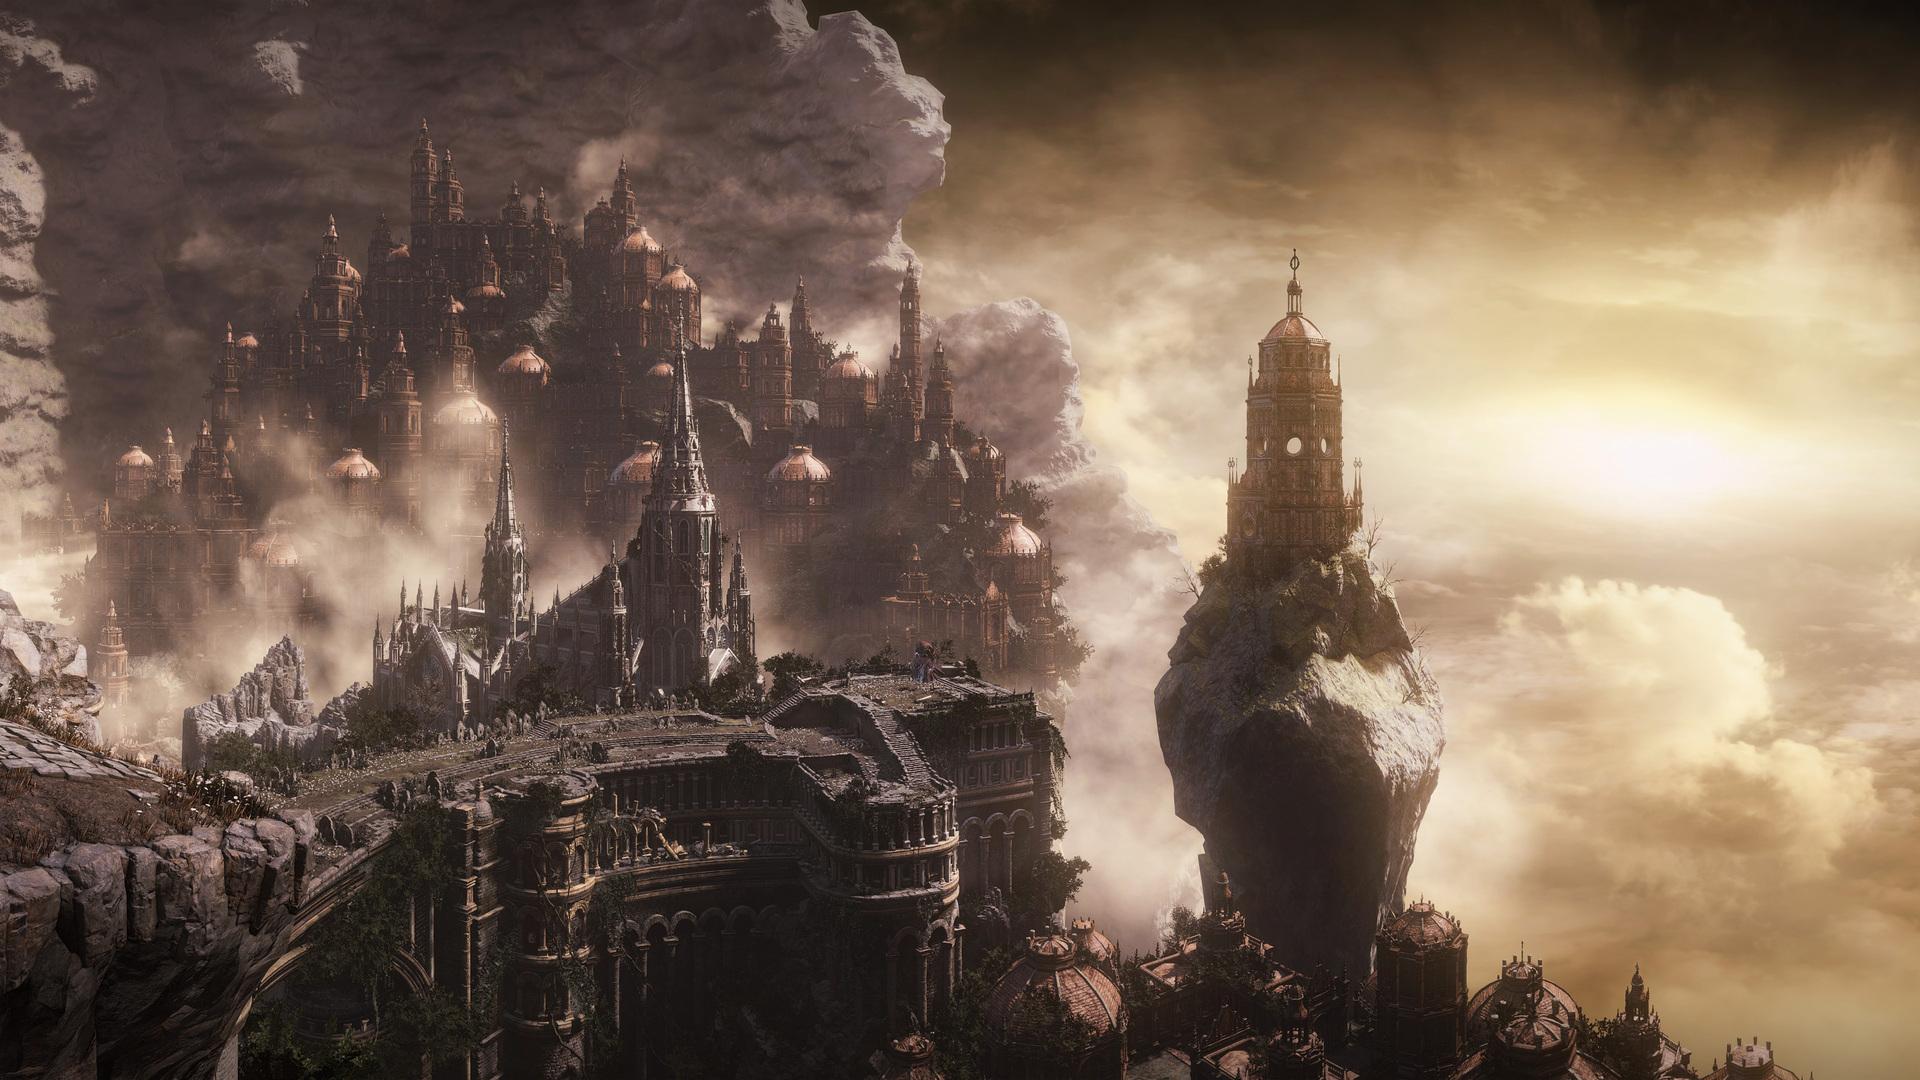 Dark Souls 3 4k Wallpaper: 1920x1080 Dark Souls 3 City Fantasy Laptop Full HD 1080P